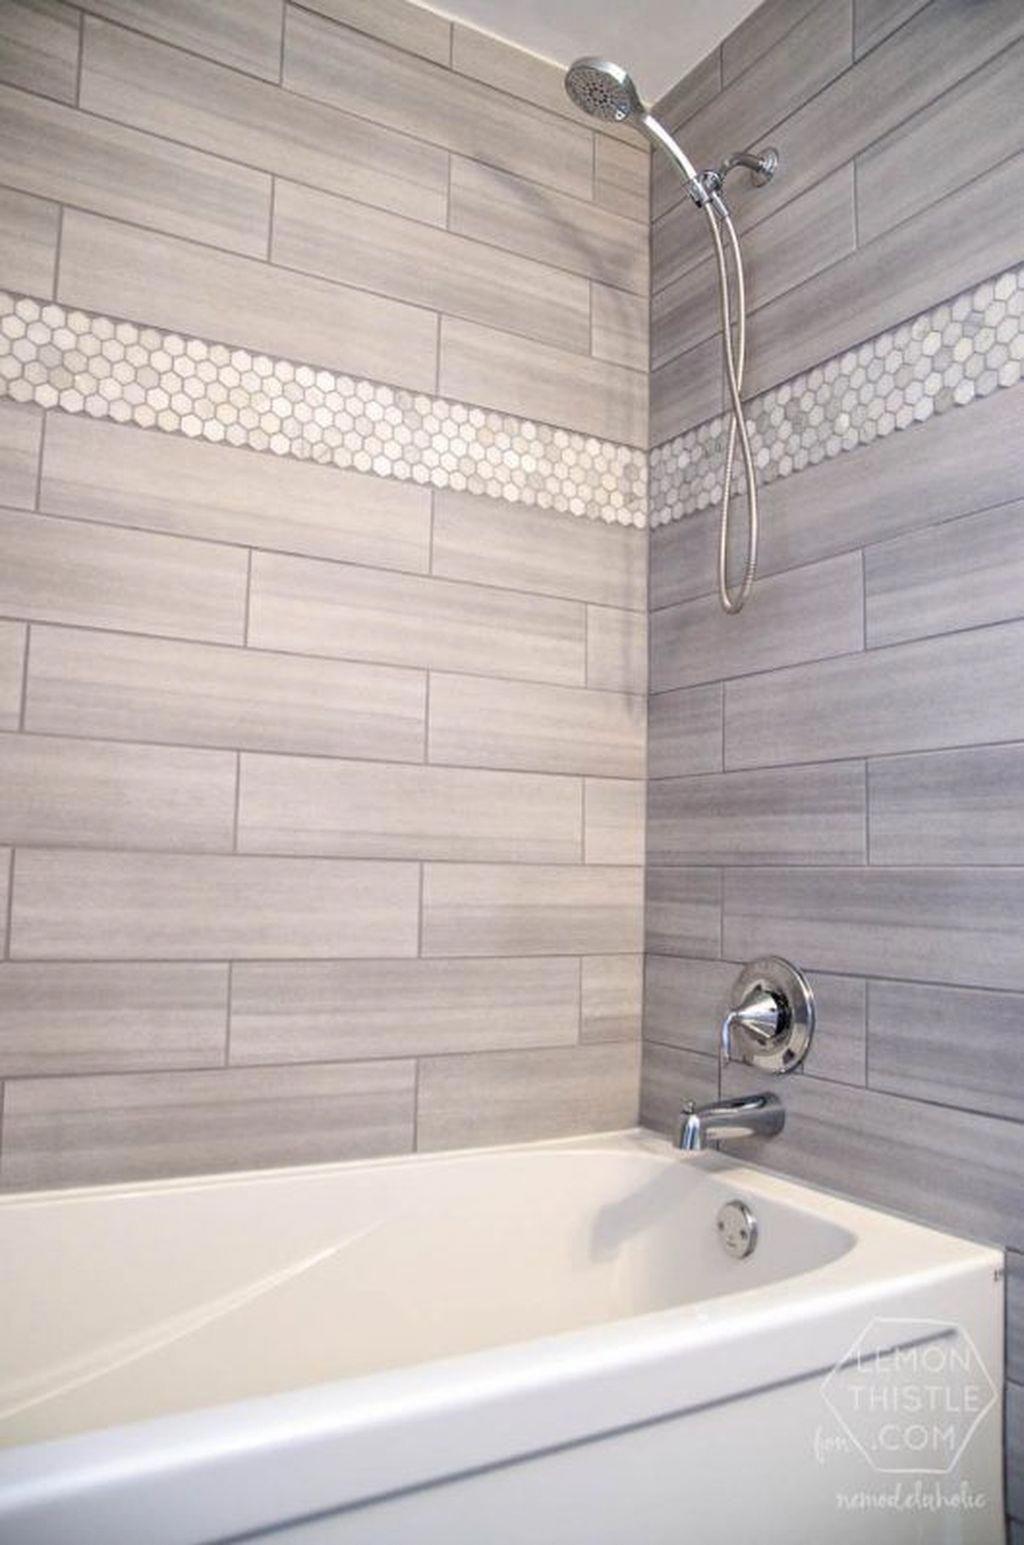 Nice 46 Beautiful Master Bathroom Remodel Design Ideas Bathroomrenovationideas Budget Bathroom Remodel Diy Bathroom Remodel Bathrooms Remodel